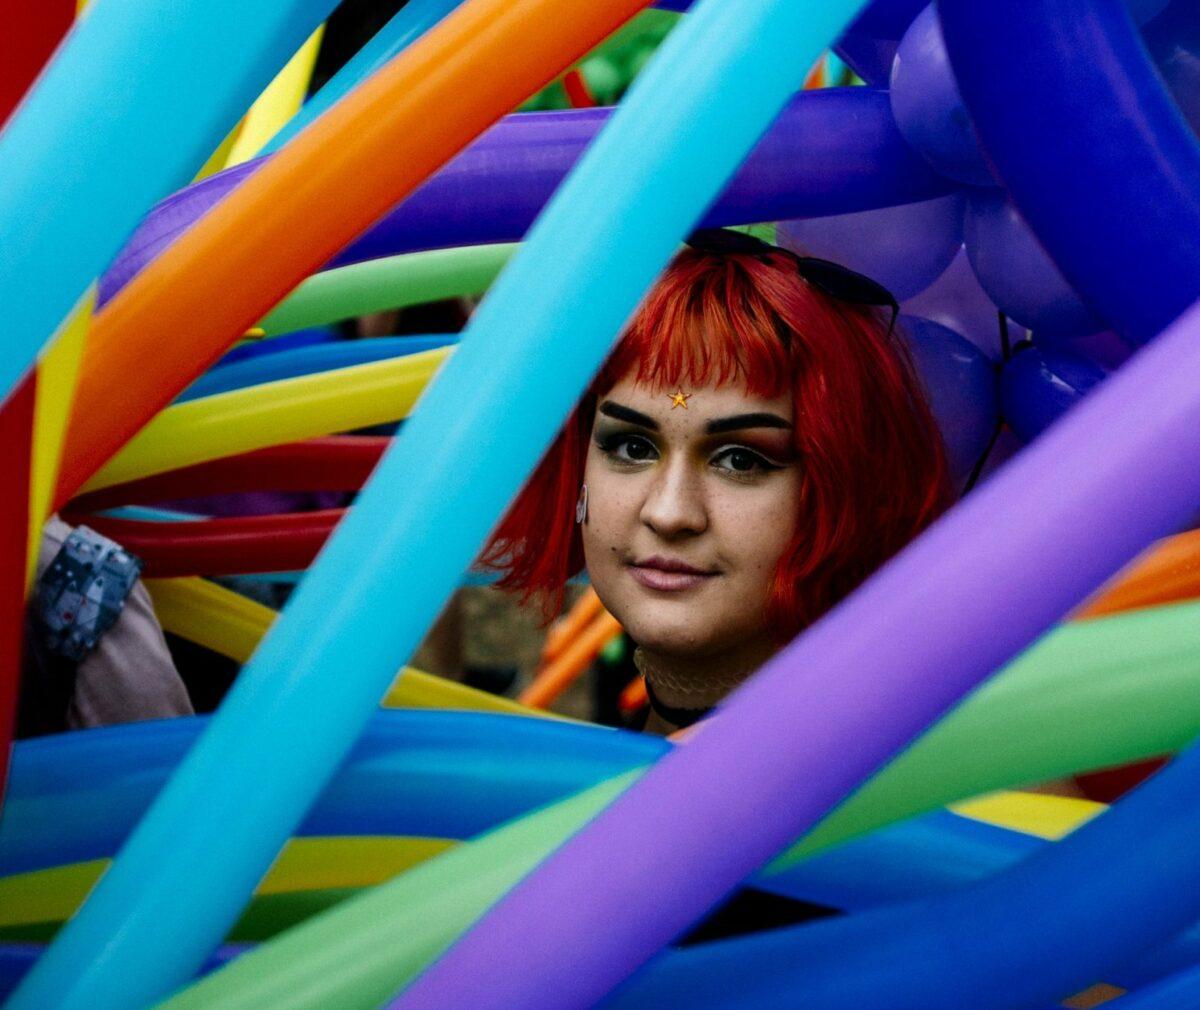 Frau mit roter Perücke in bunten Luftballons